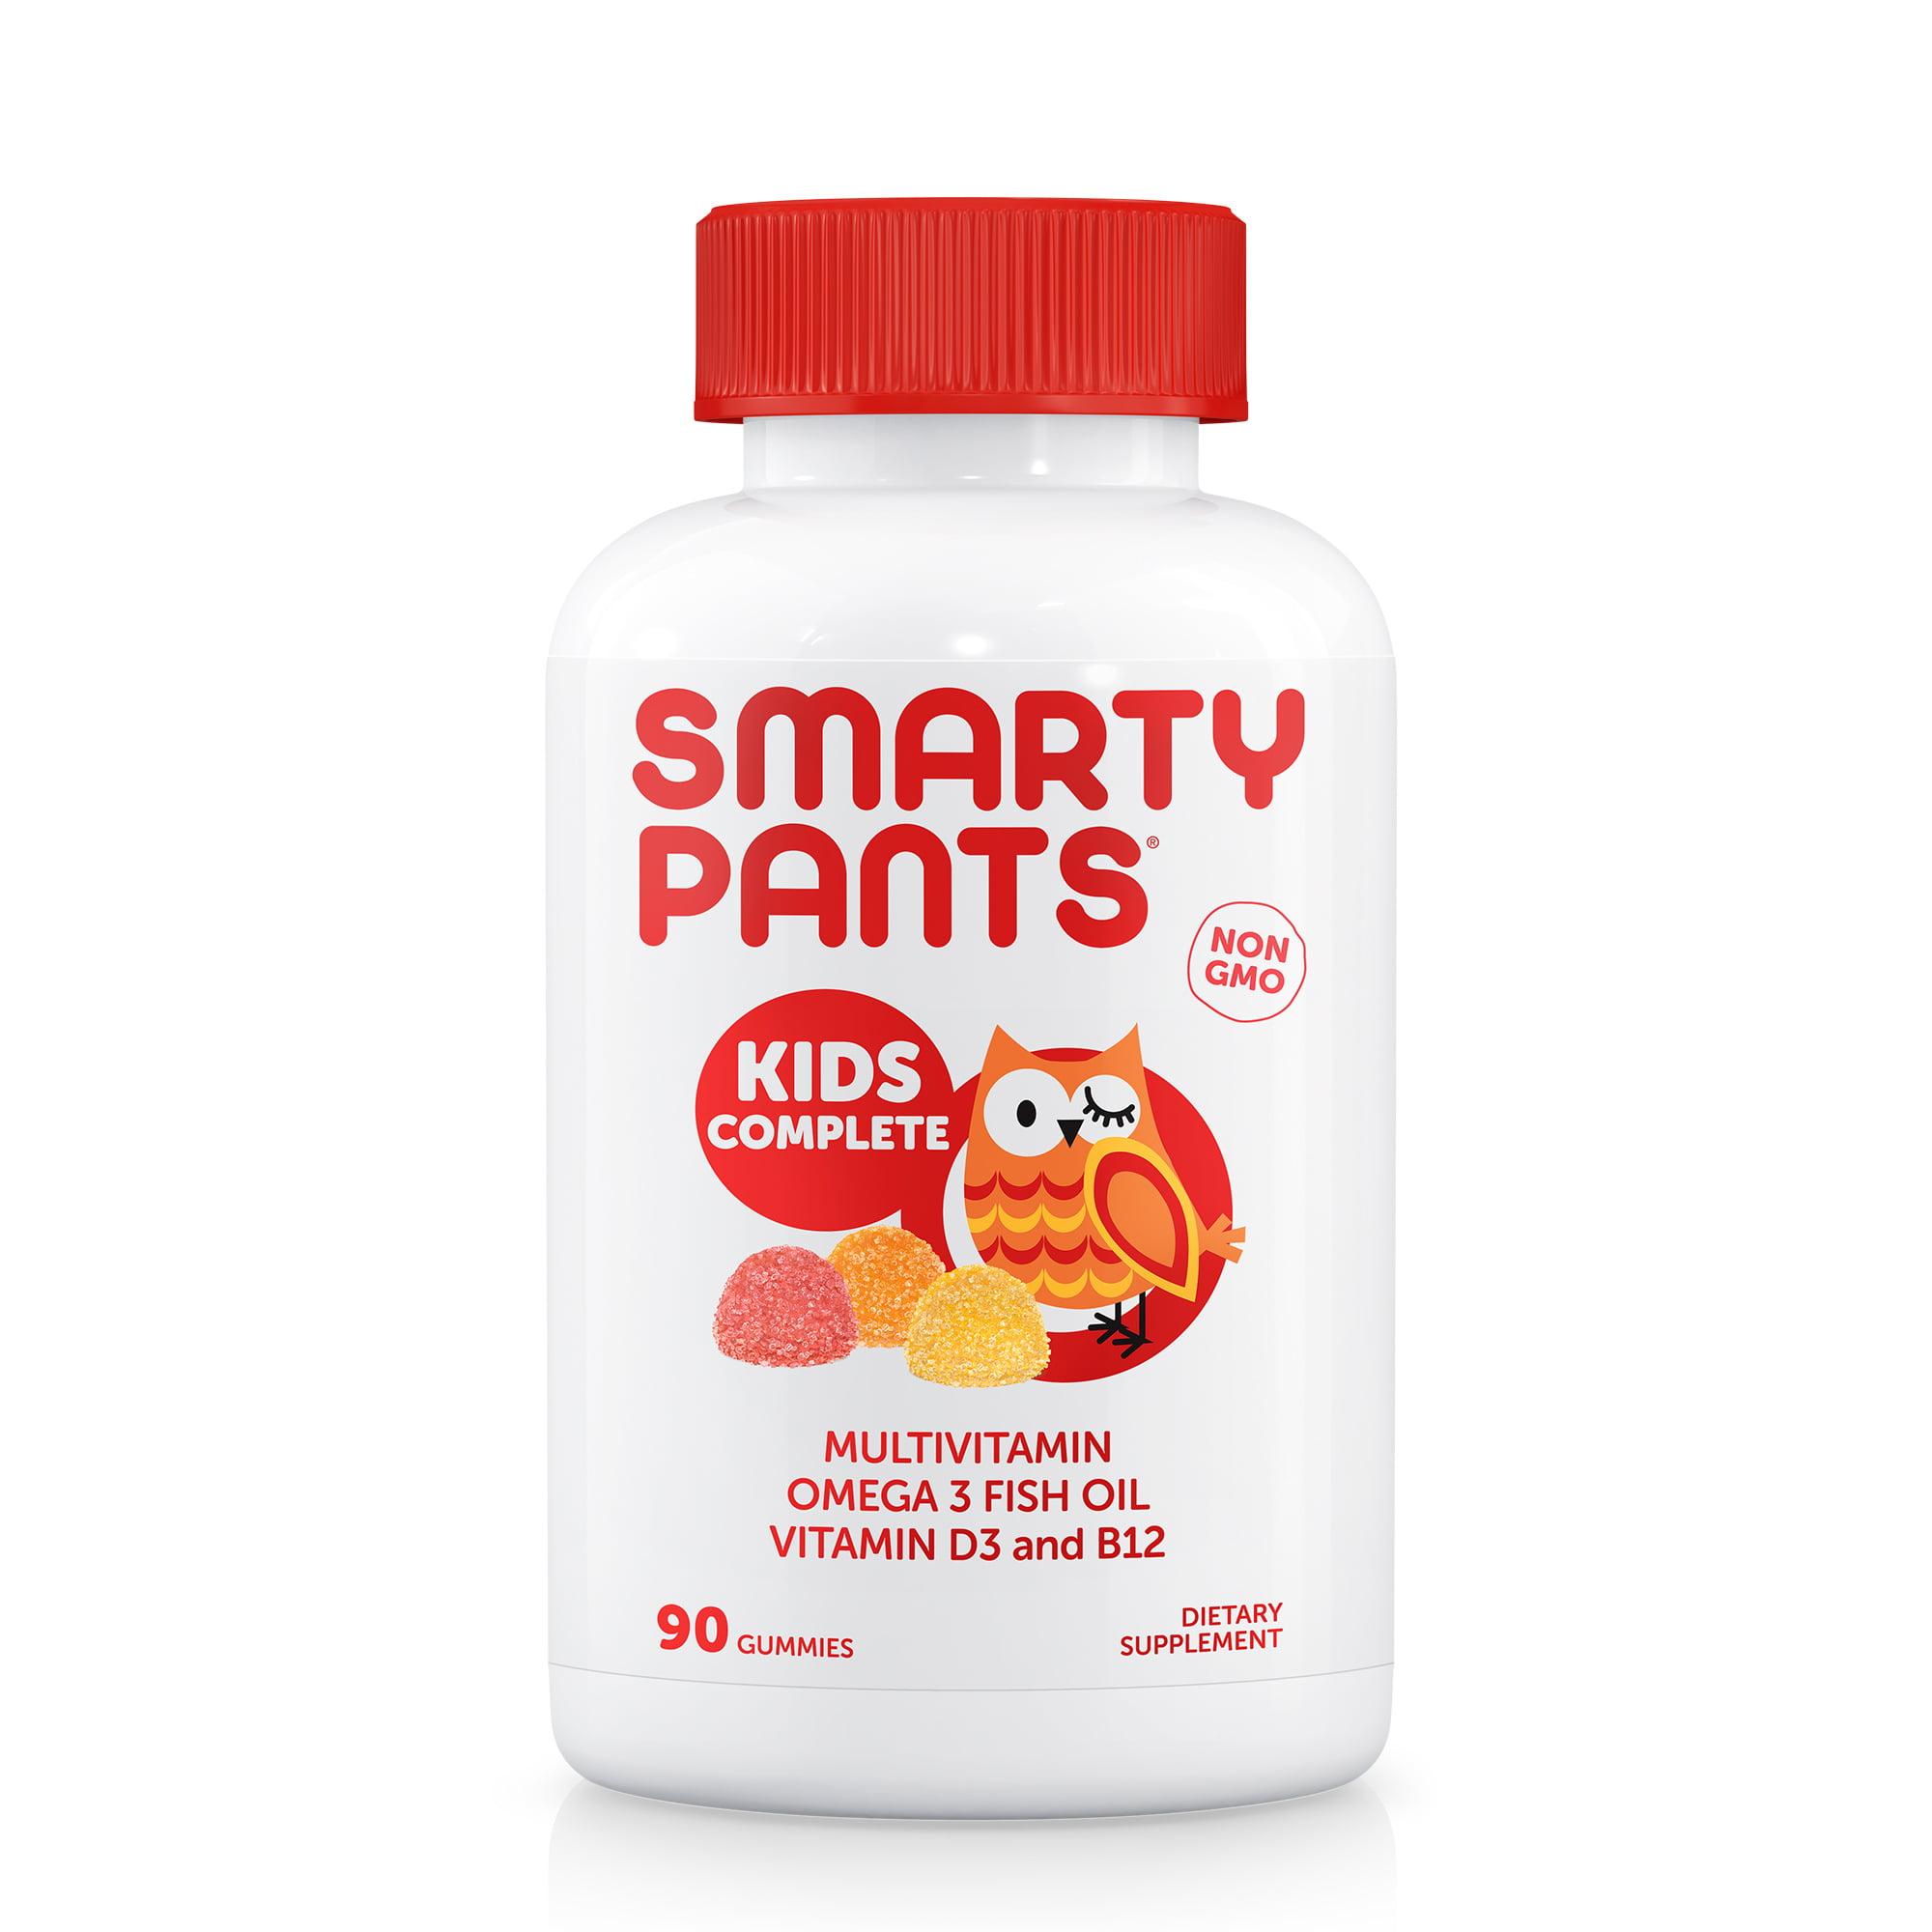 Smartypants Kids Complete Daily Gummy Vitamins: Gluten Free, Multivitamin & Omega 3...